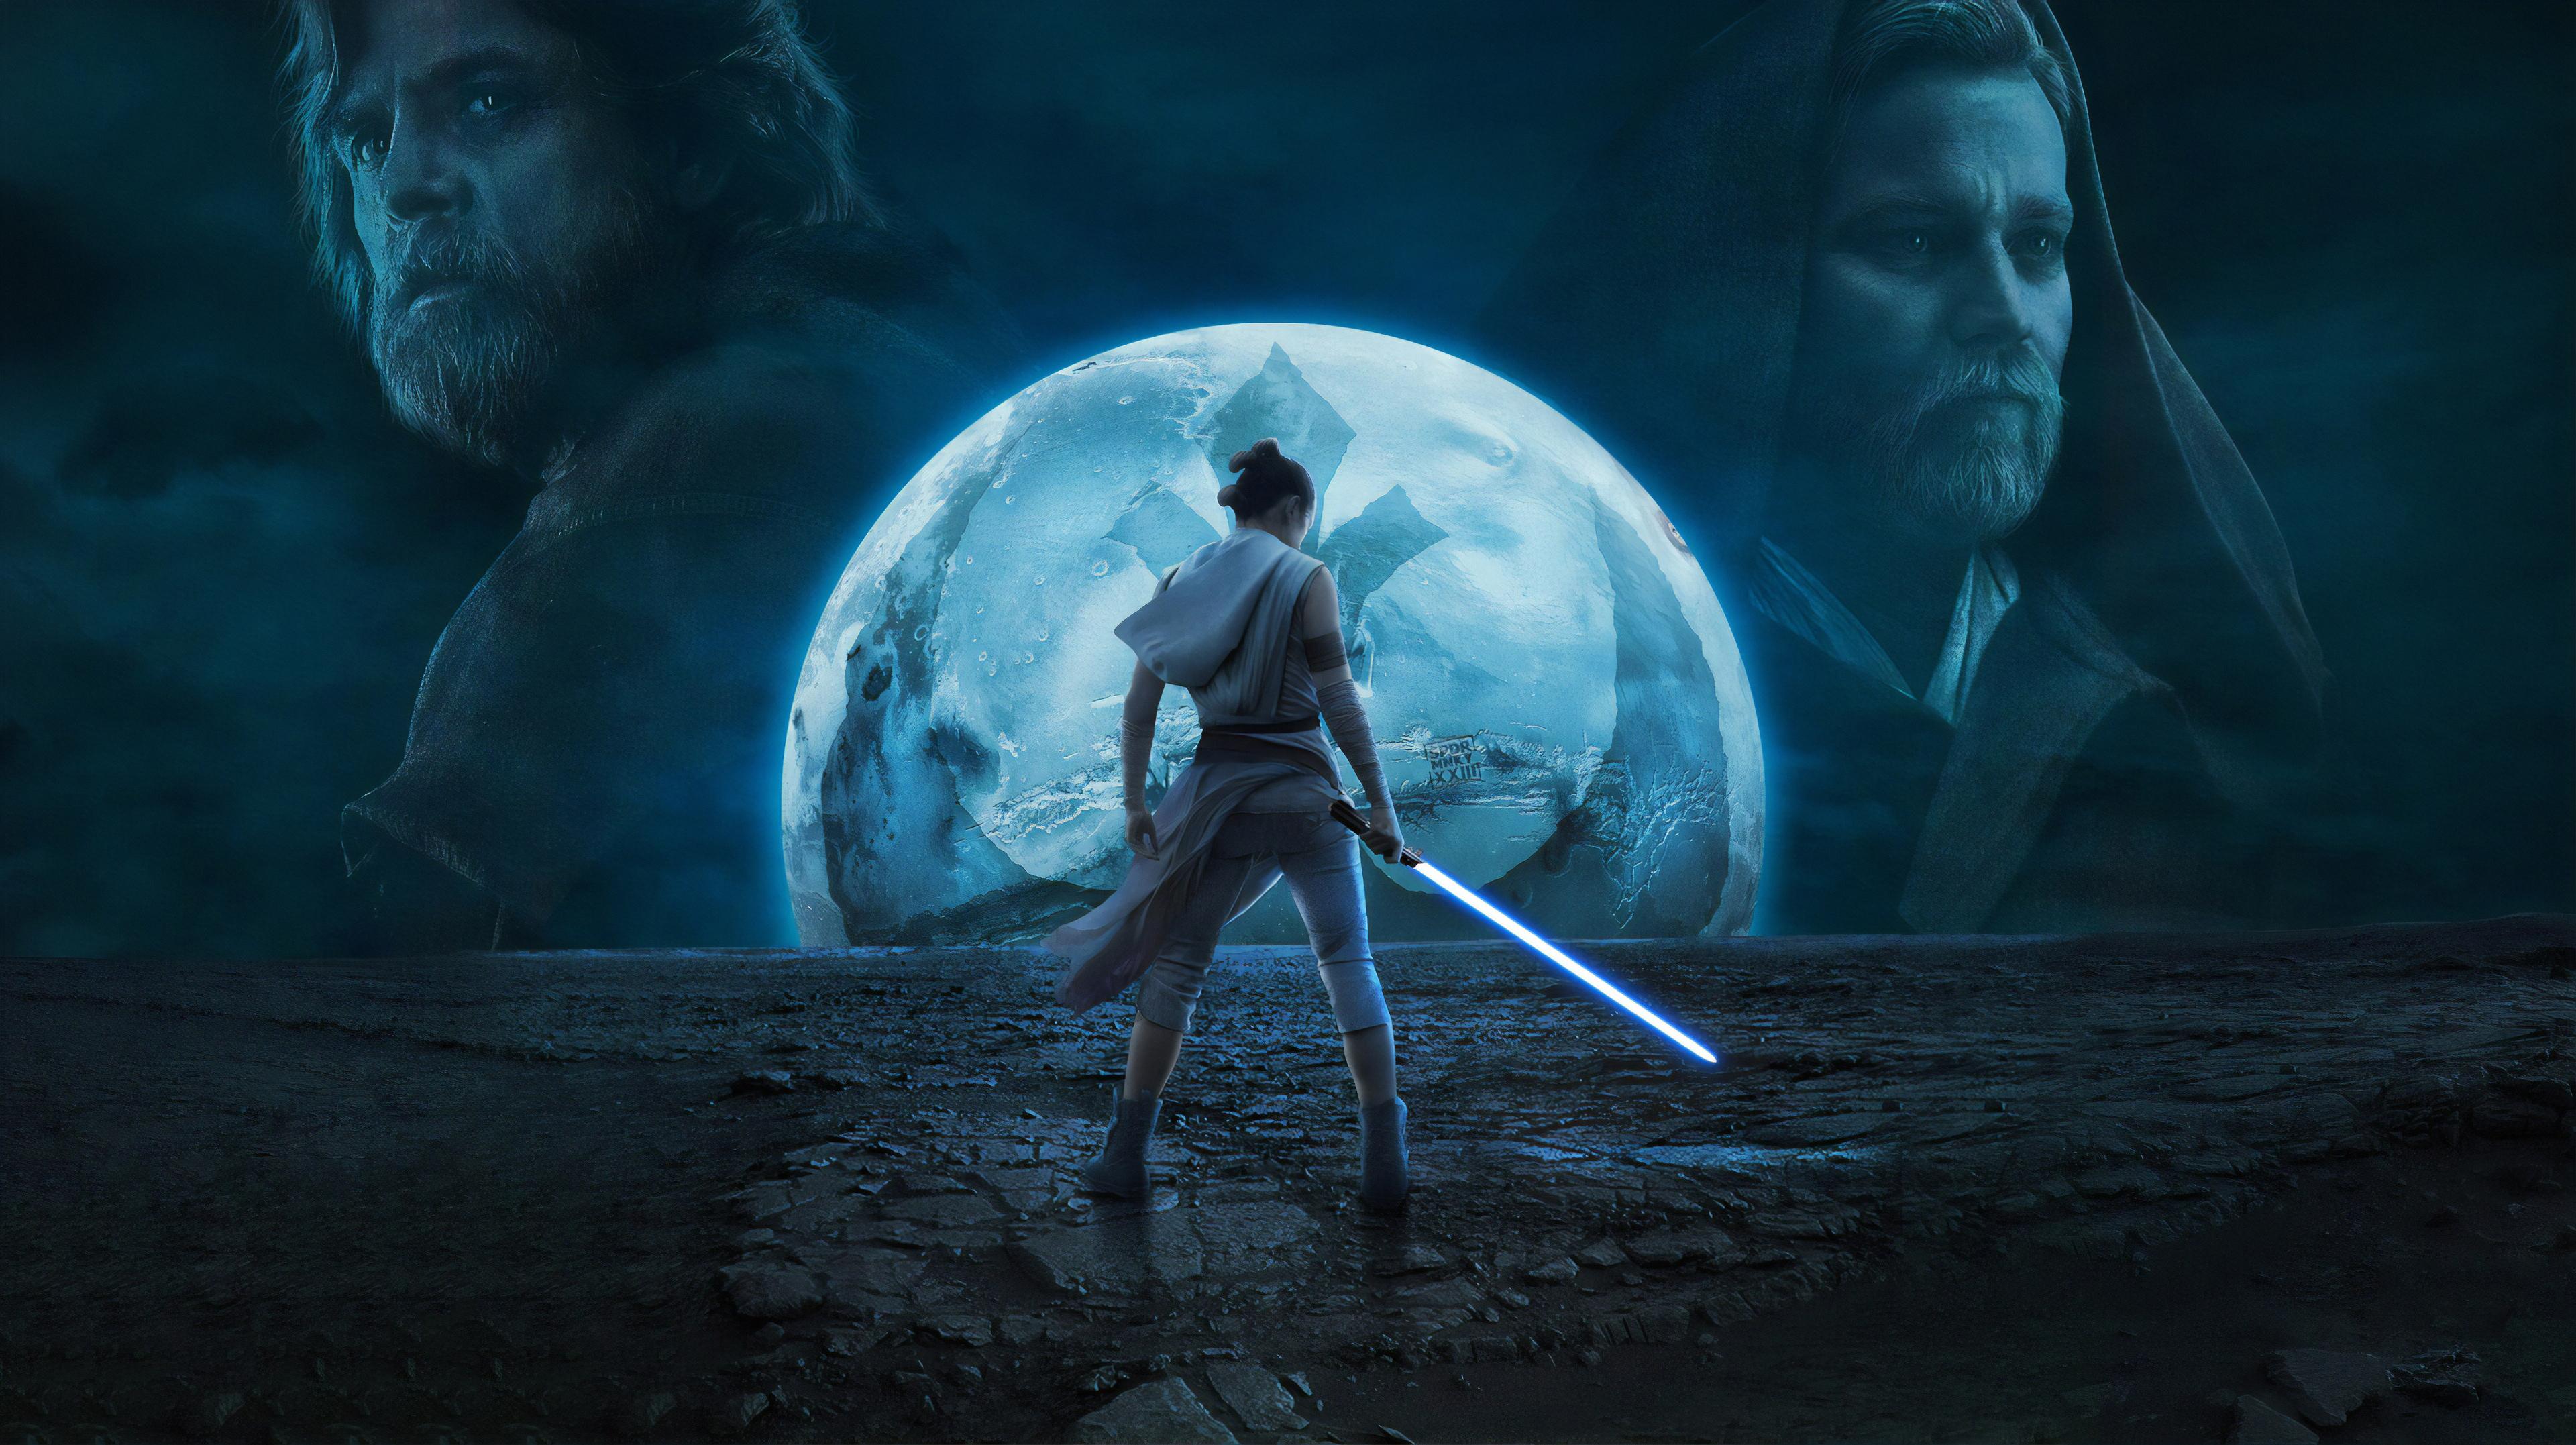 Wallpaper Hd 4k Star Wars